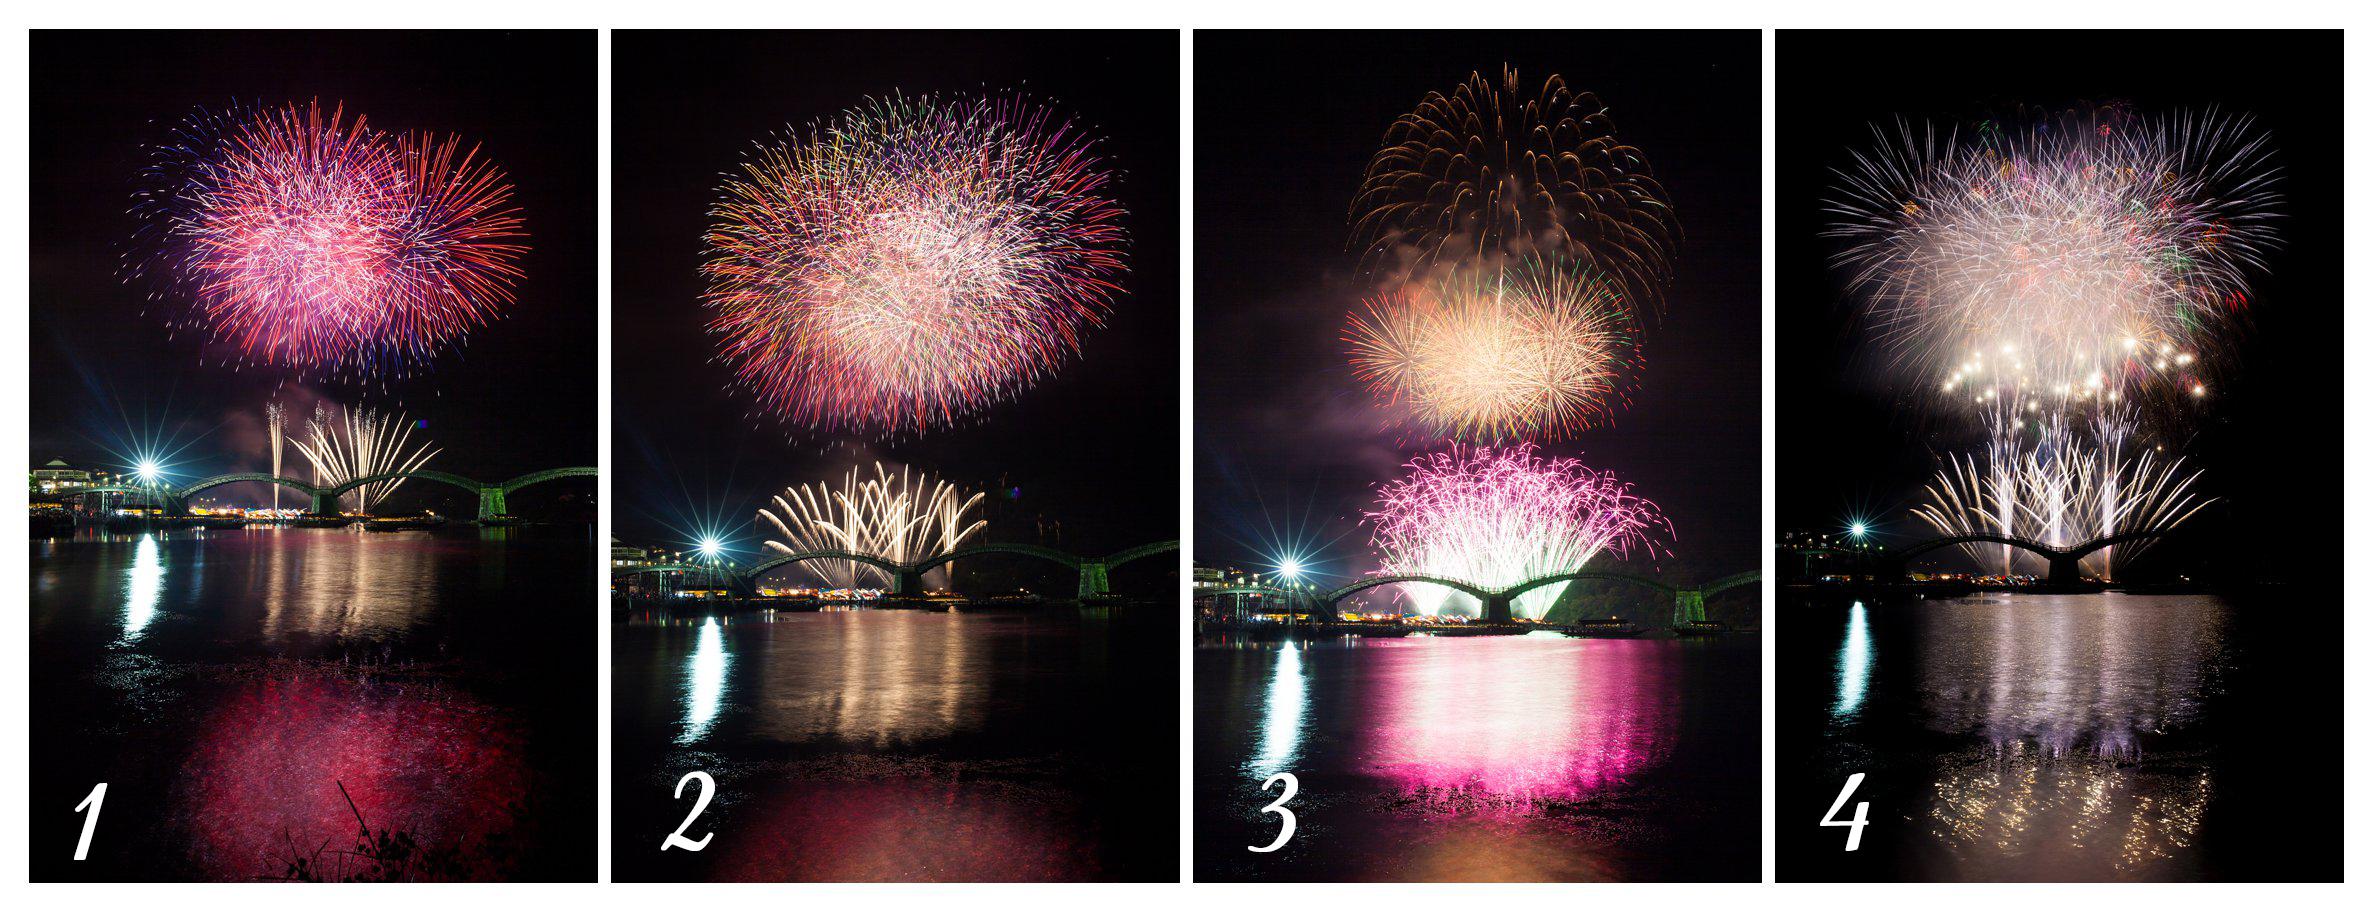 fireworks kintai bridge japan